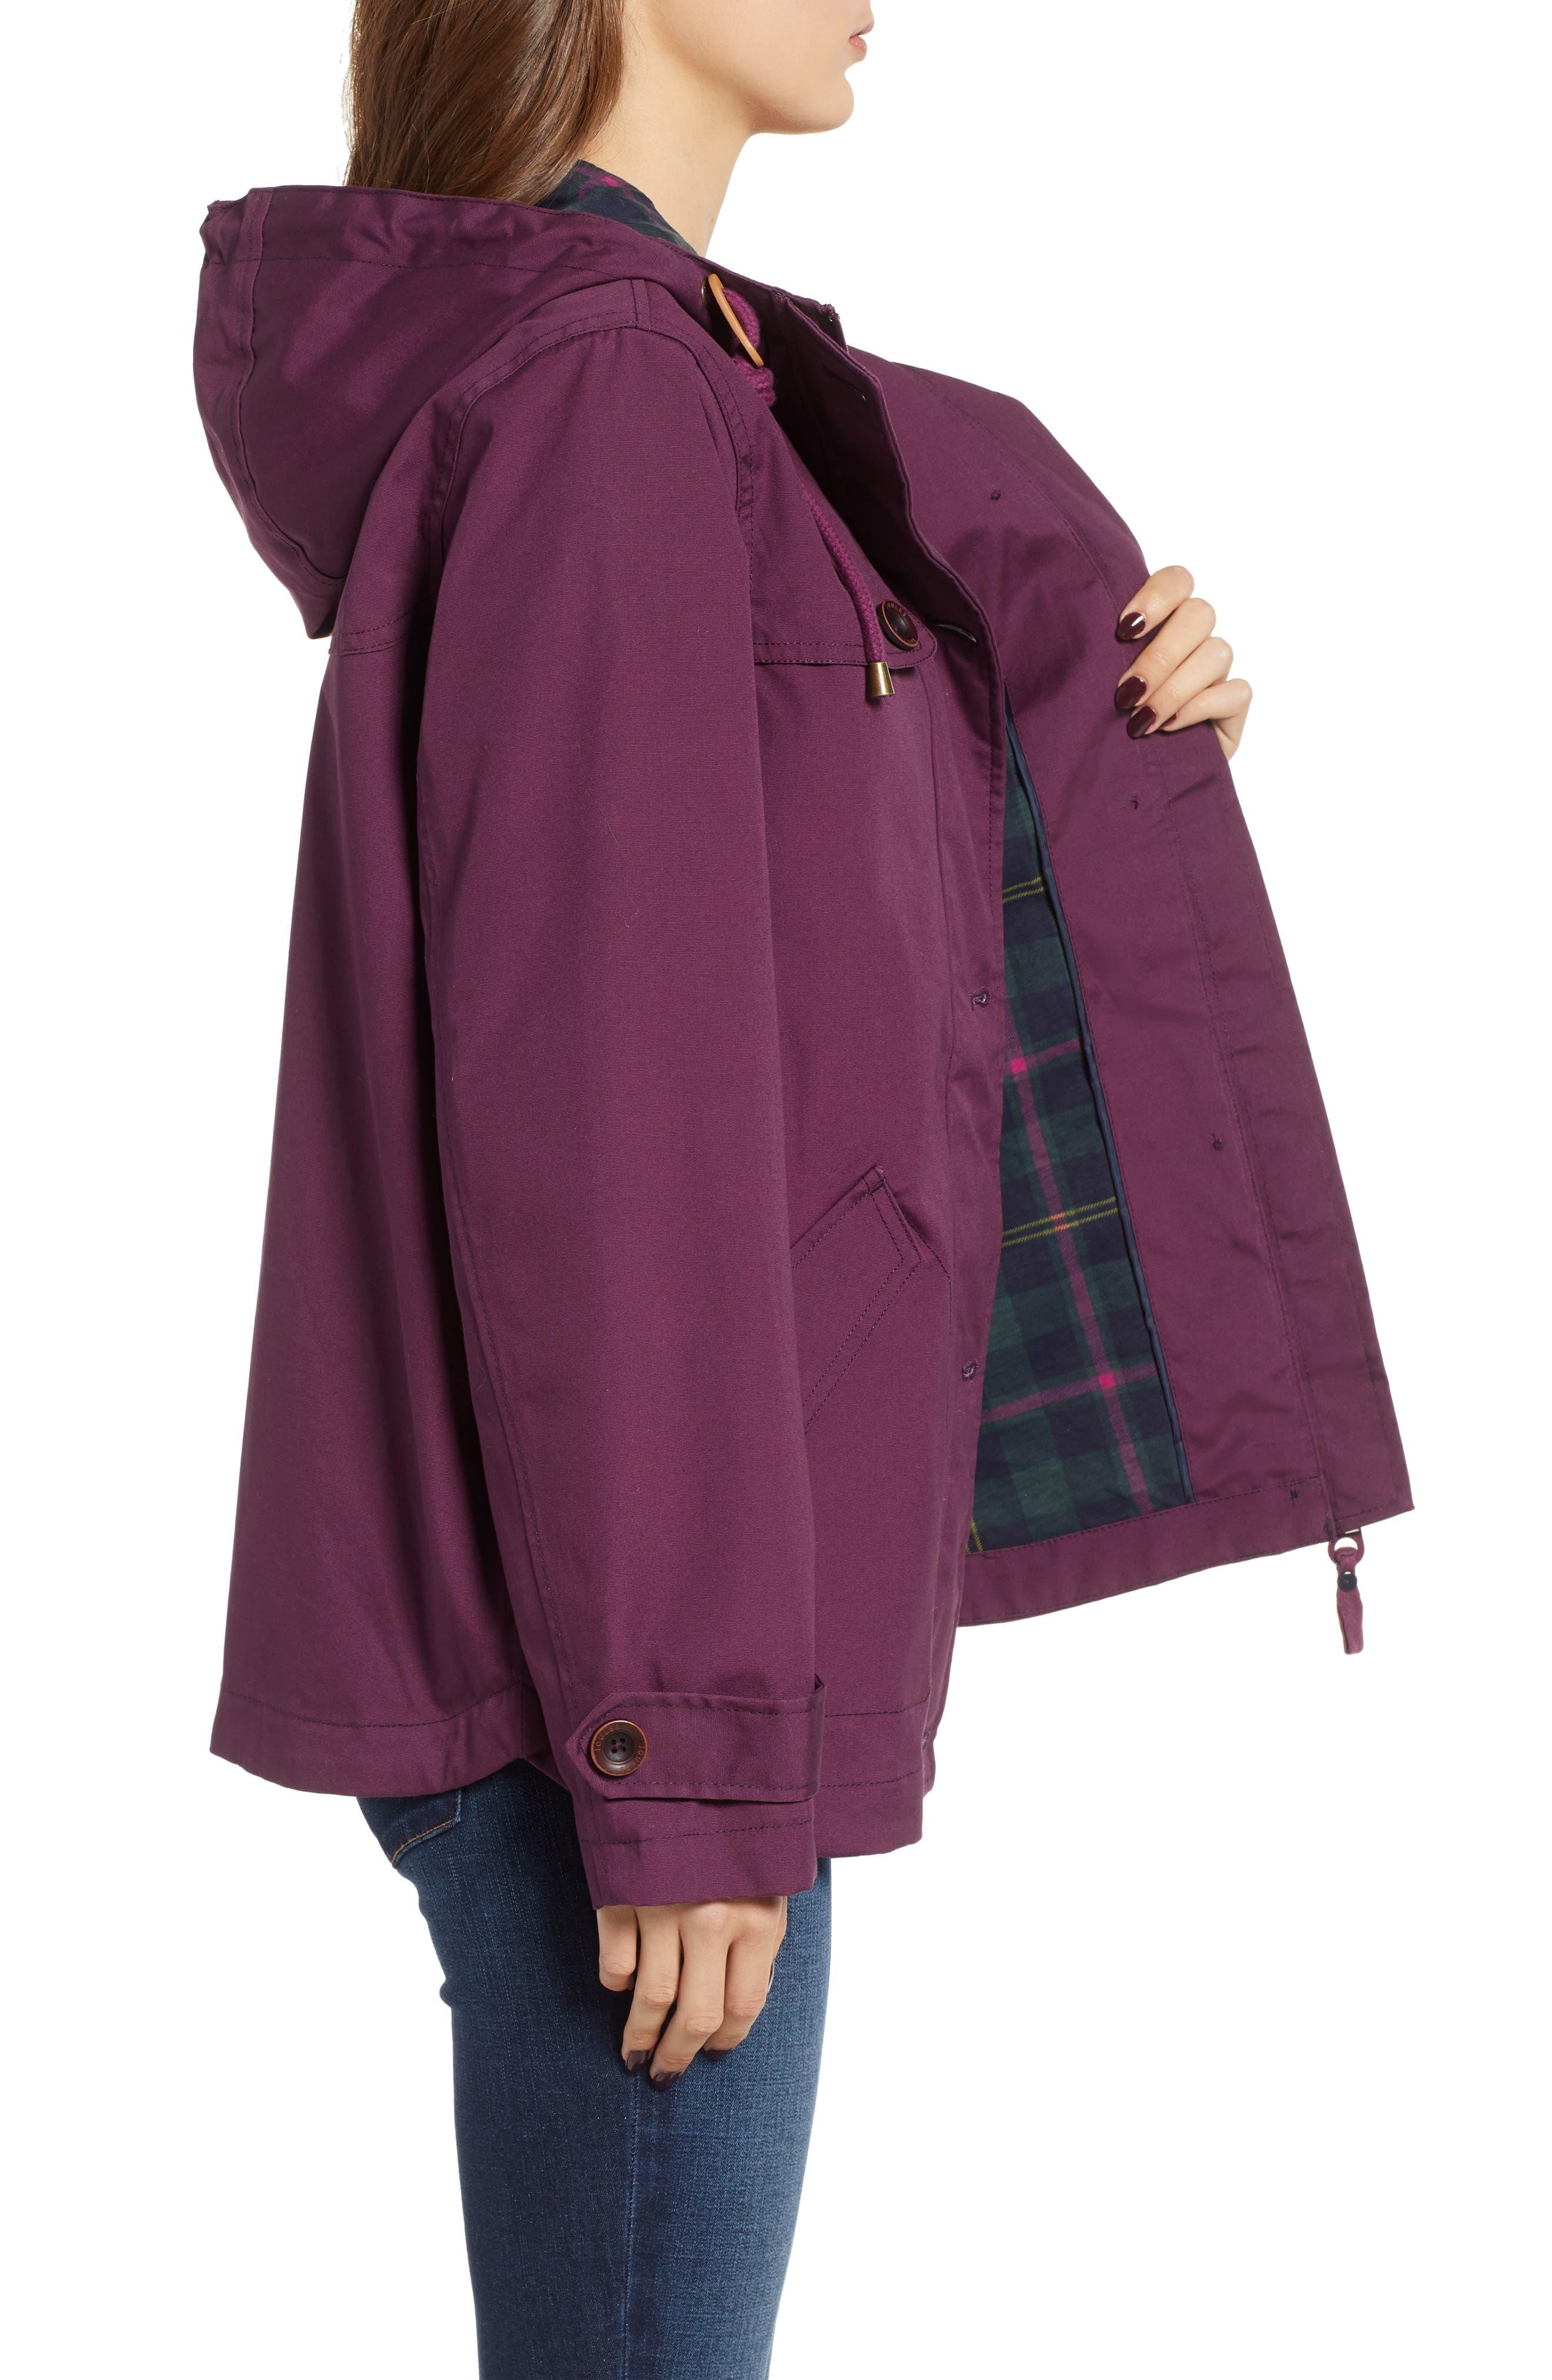 JOULES,                             Right as Rain Waterproof Hooded Jacket,                             Alternate thumbnail 3, color,                             930